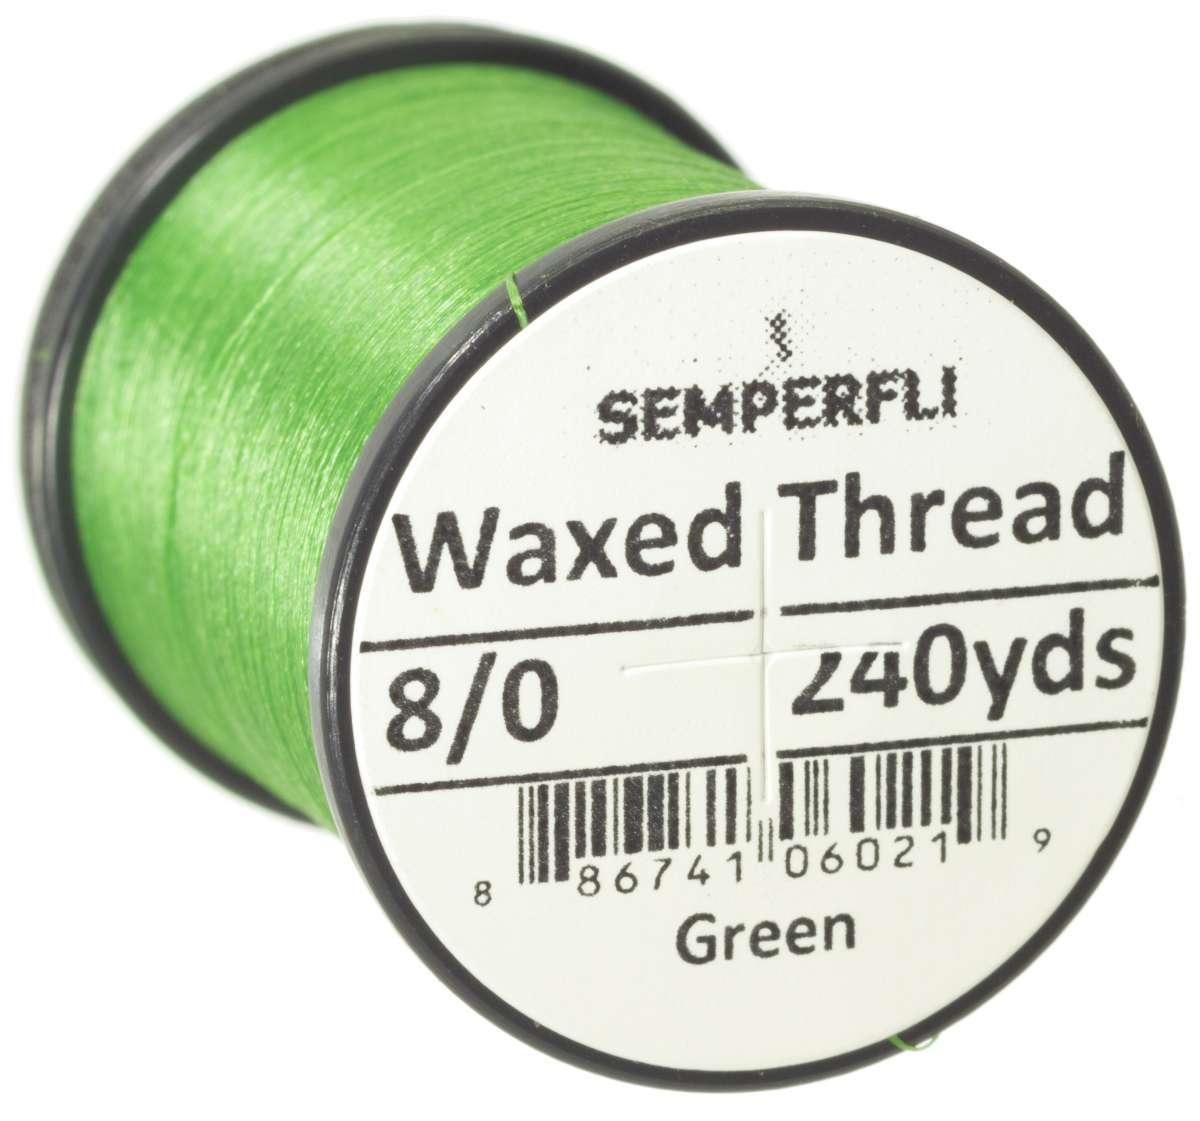 8/0 Classic Waxed Thread Green Sem-0400-1604